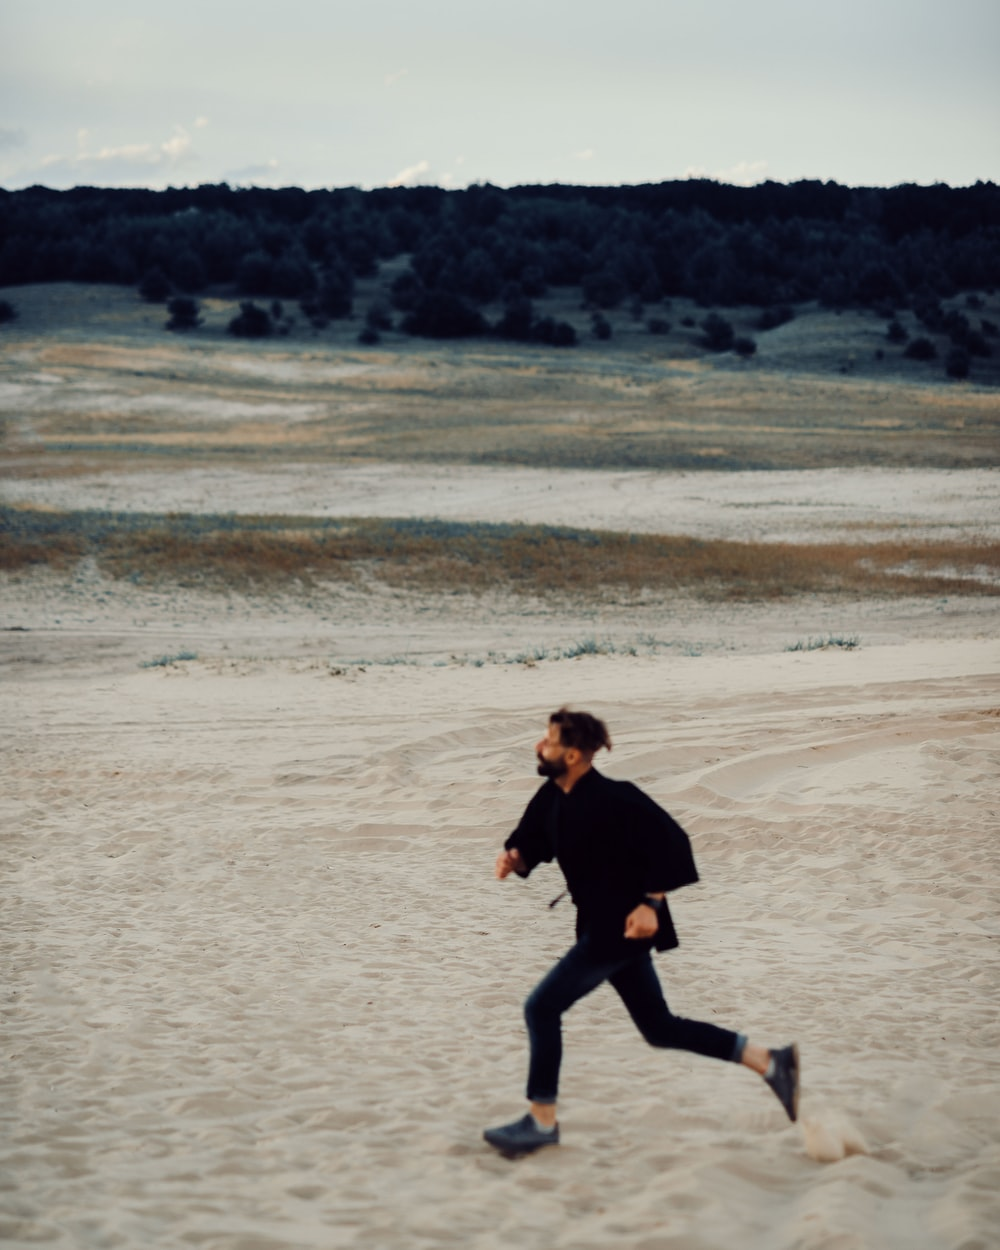 man in black shirt running on beach during daytime